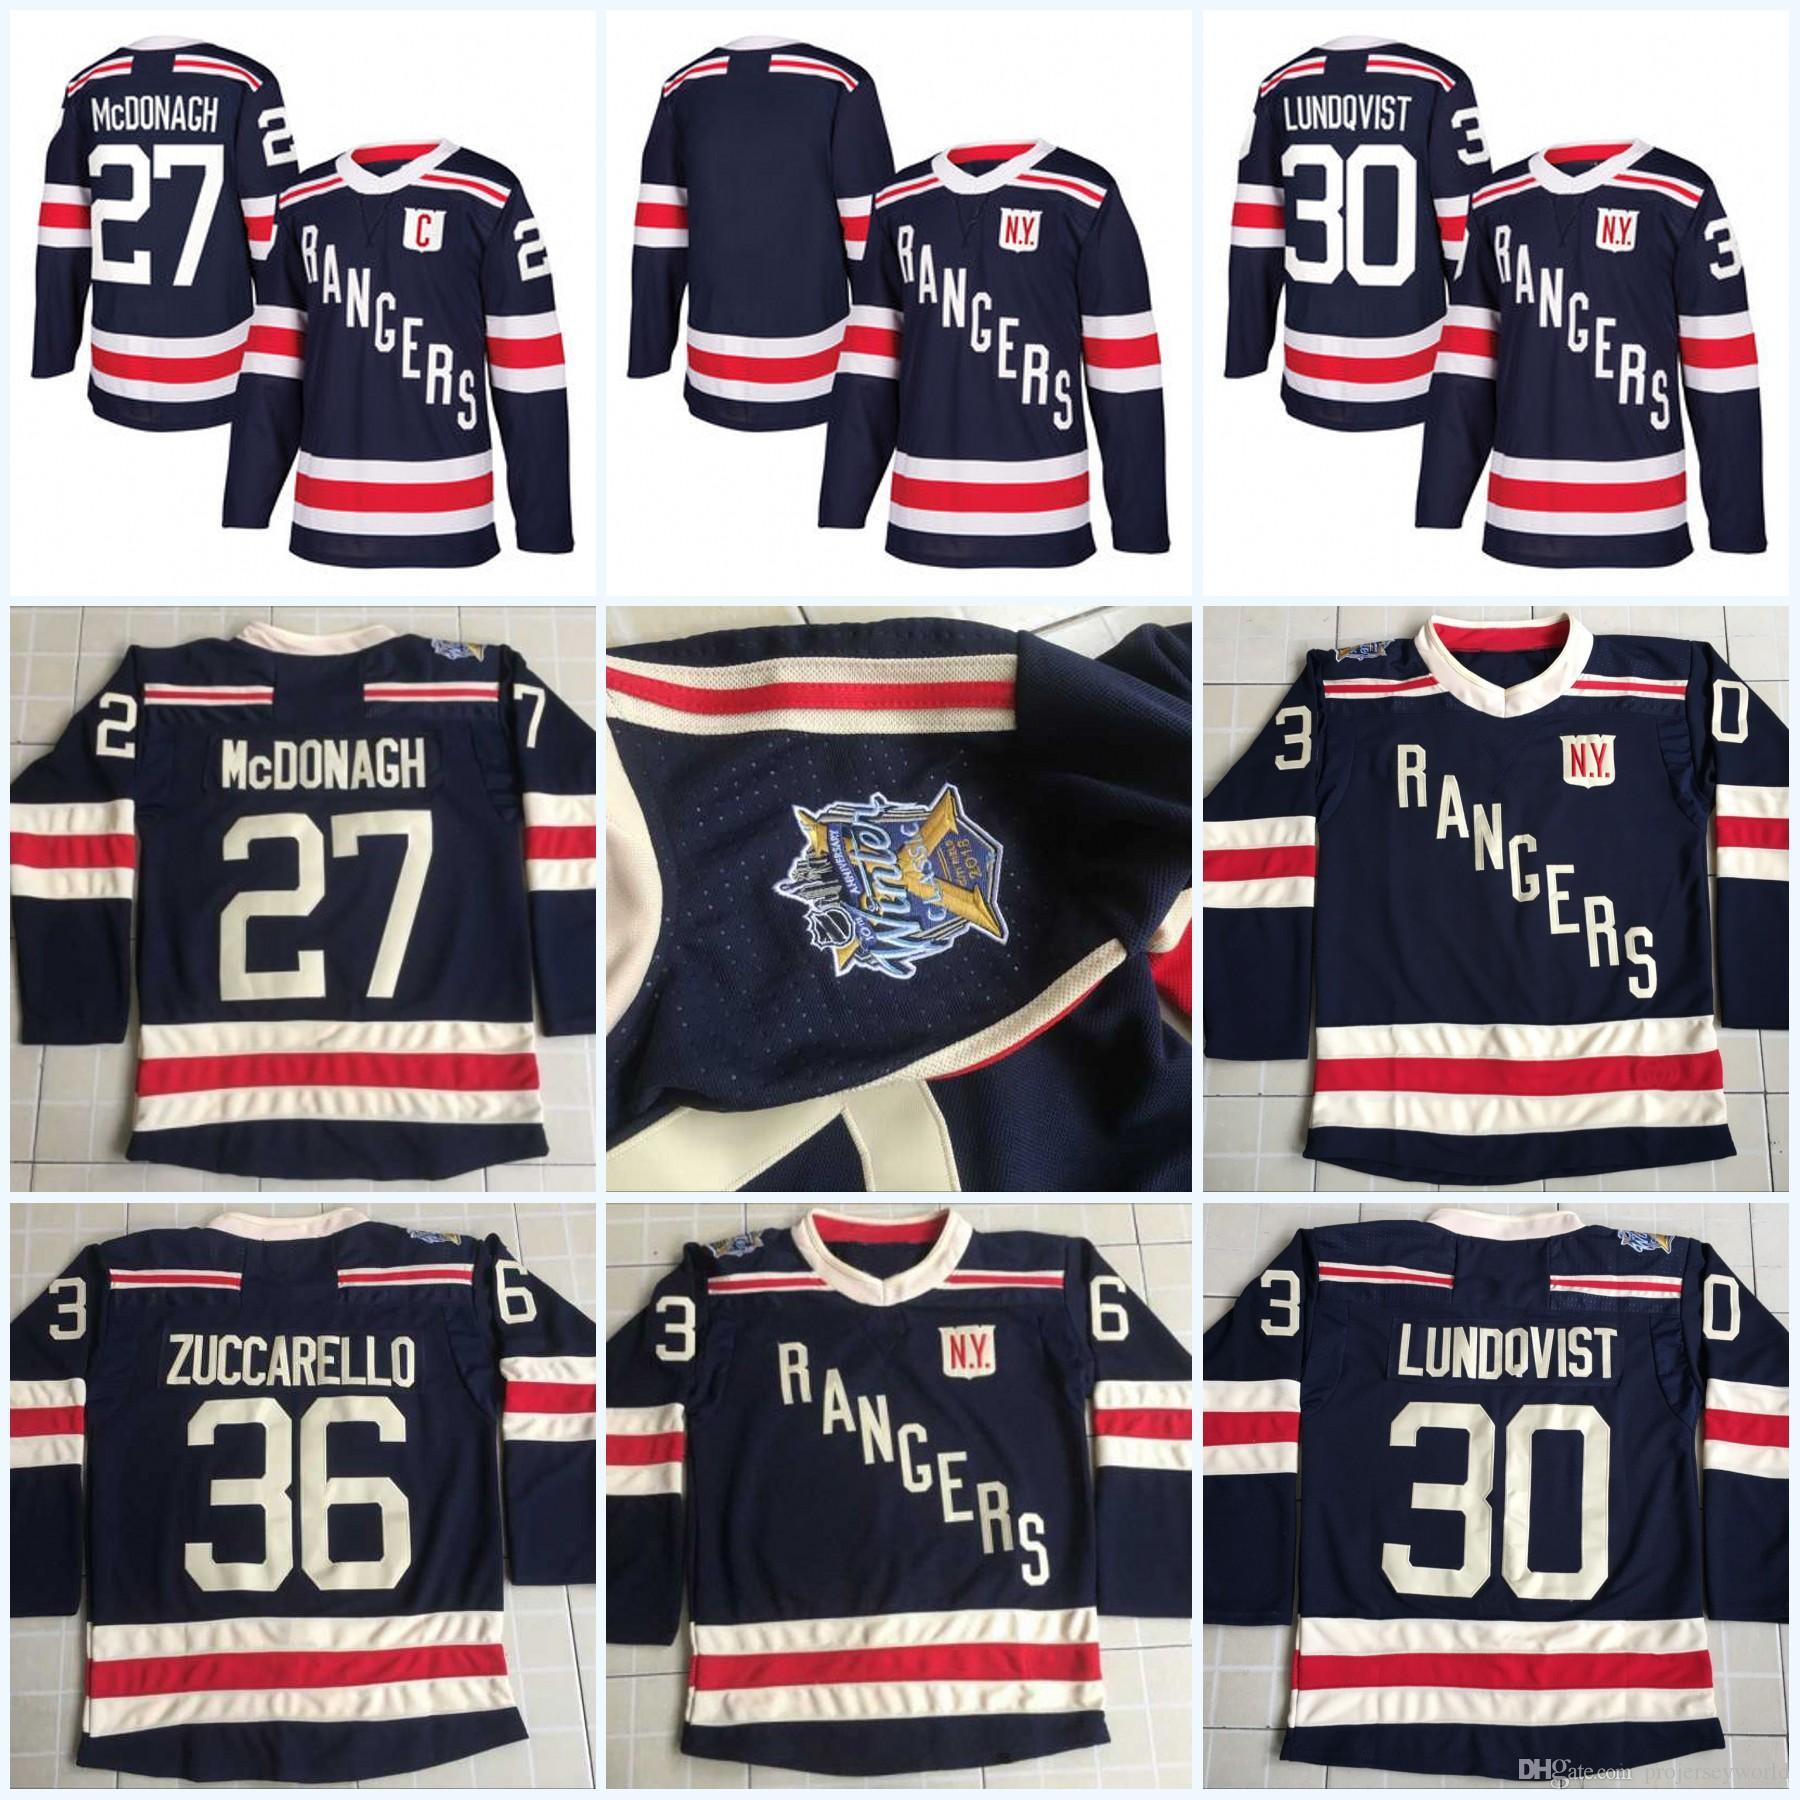 huge discount a7041 d583d Youth 2018 Winter Classic New York Rangers Jerseys 27 Ryan McDonagh 30  Henrik Lundqvist 36 Mats Zuccarello 93 Mika Zibanejad Hockey Jerseys